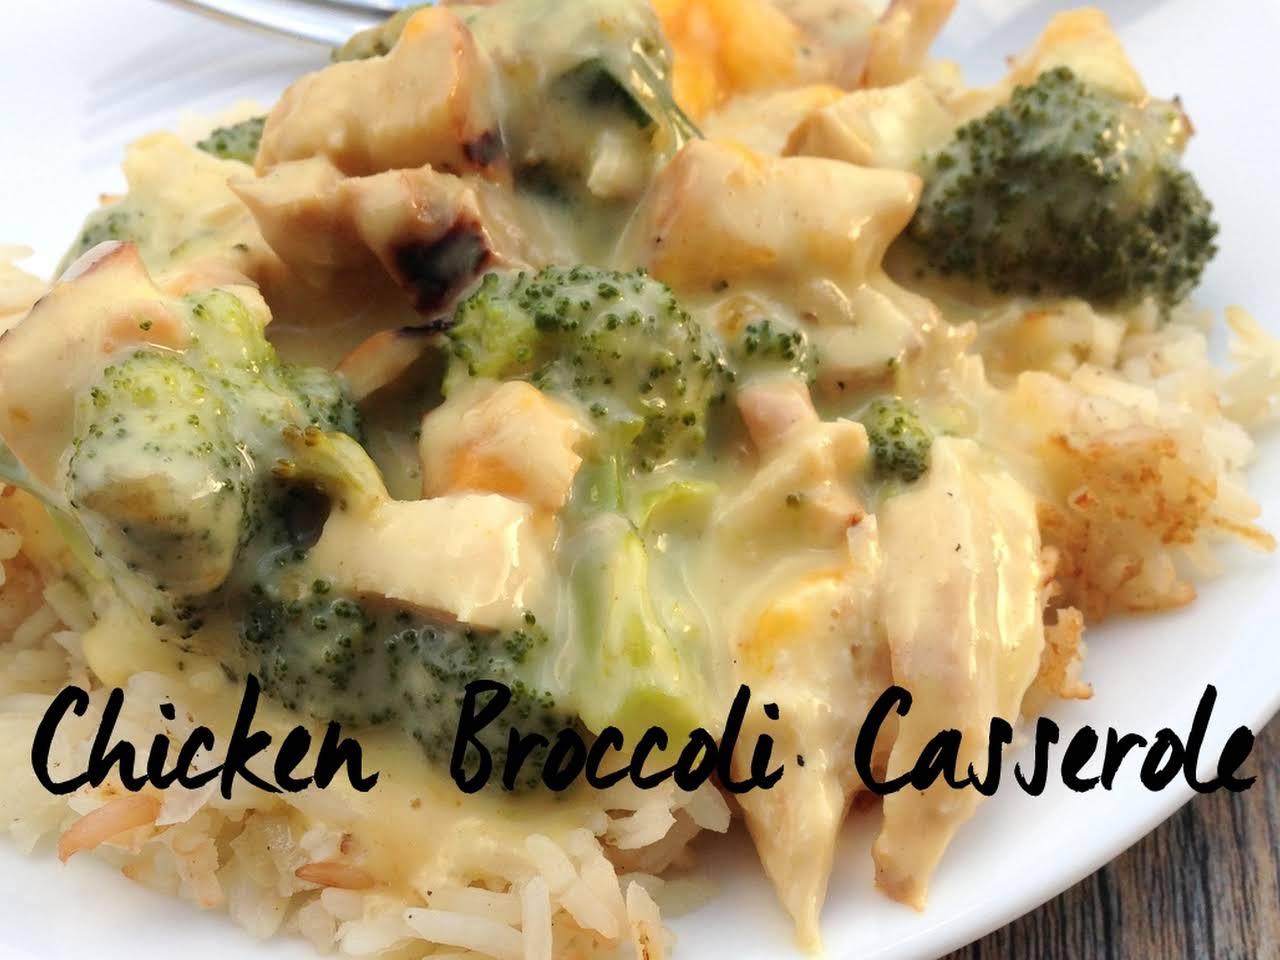 10 Best Chicken Broccoli Casserole Recipes Yummly